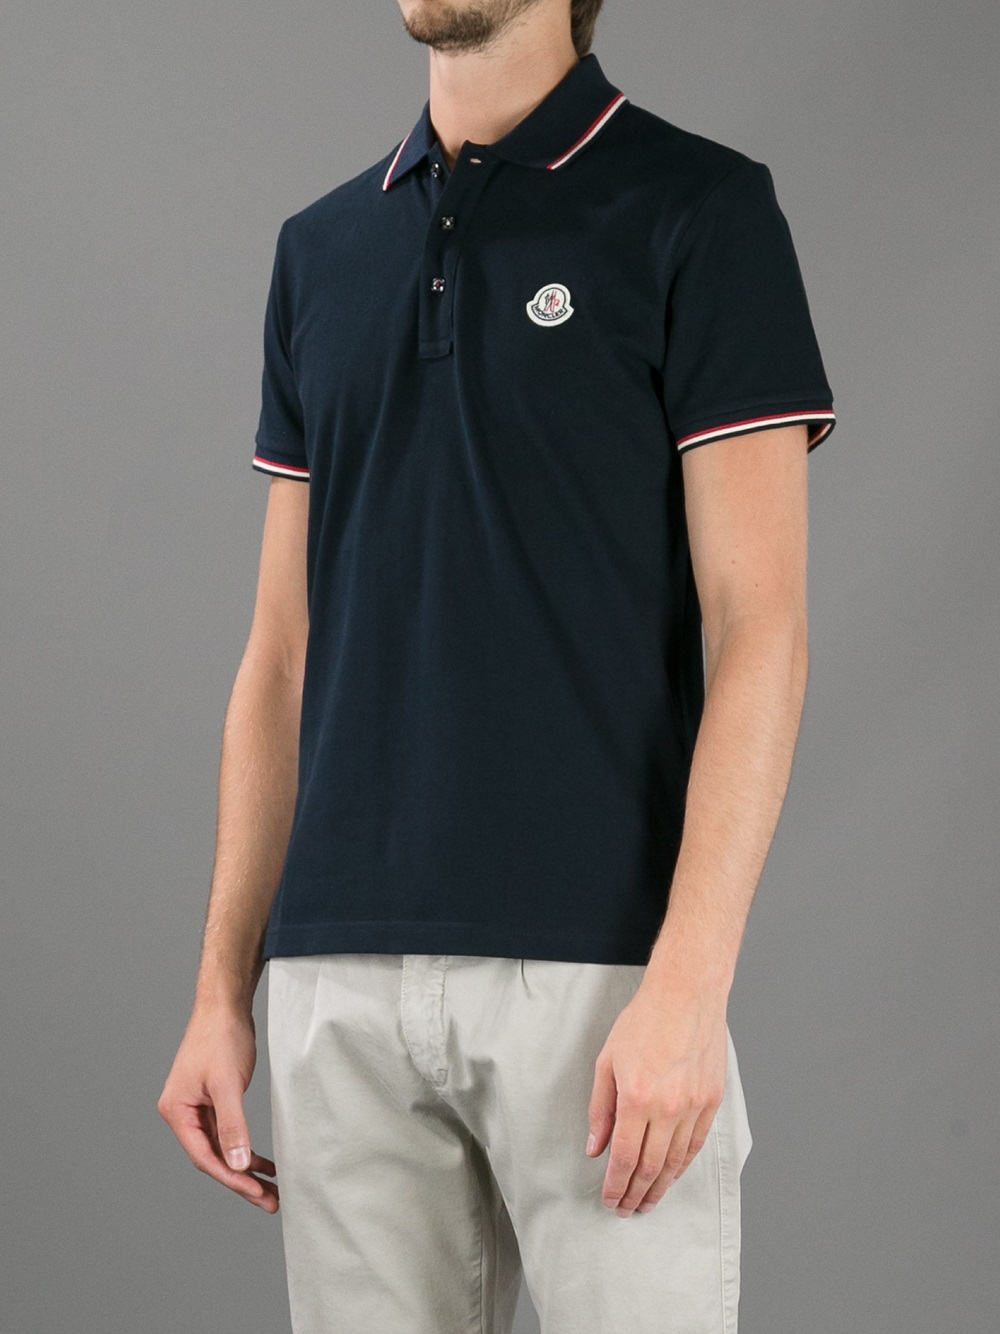 moncler polo shirt farfetch